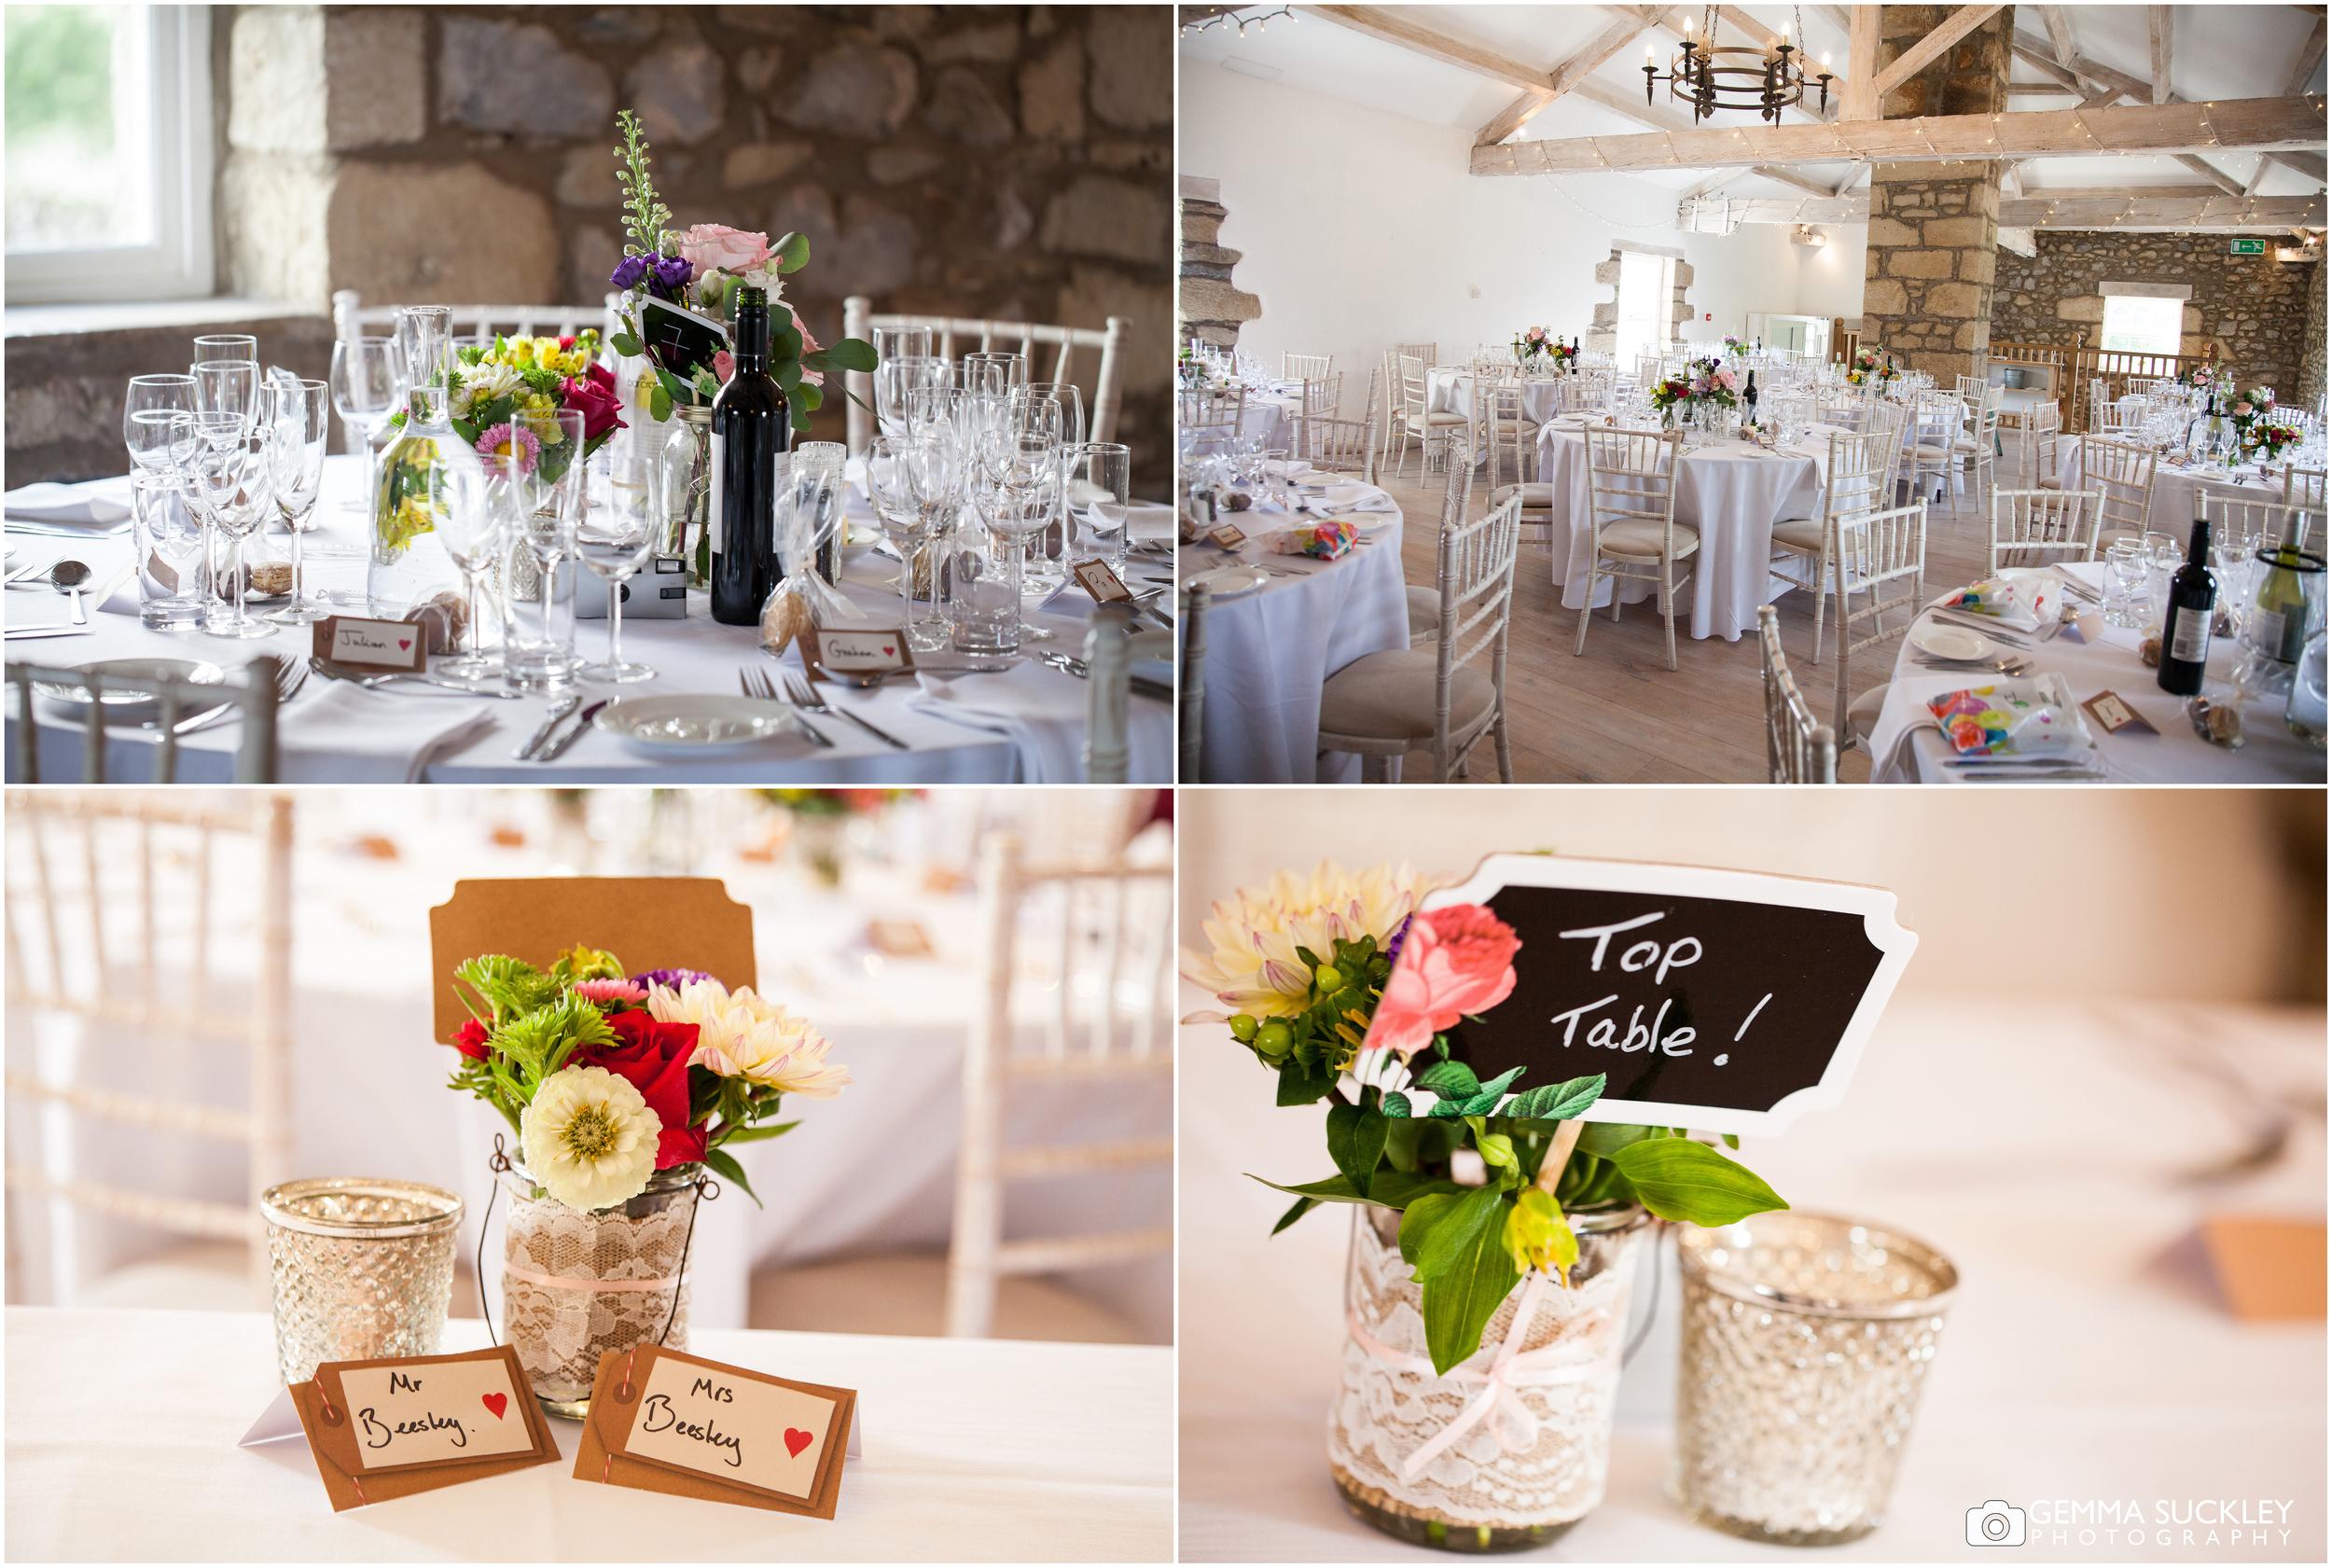 wedding-table-details-at-taitlandsjpg.jpg